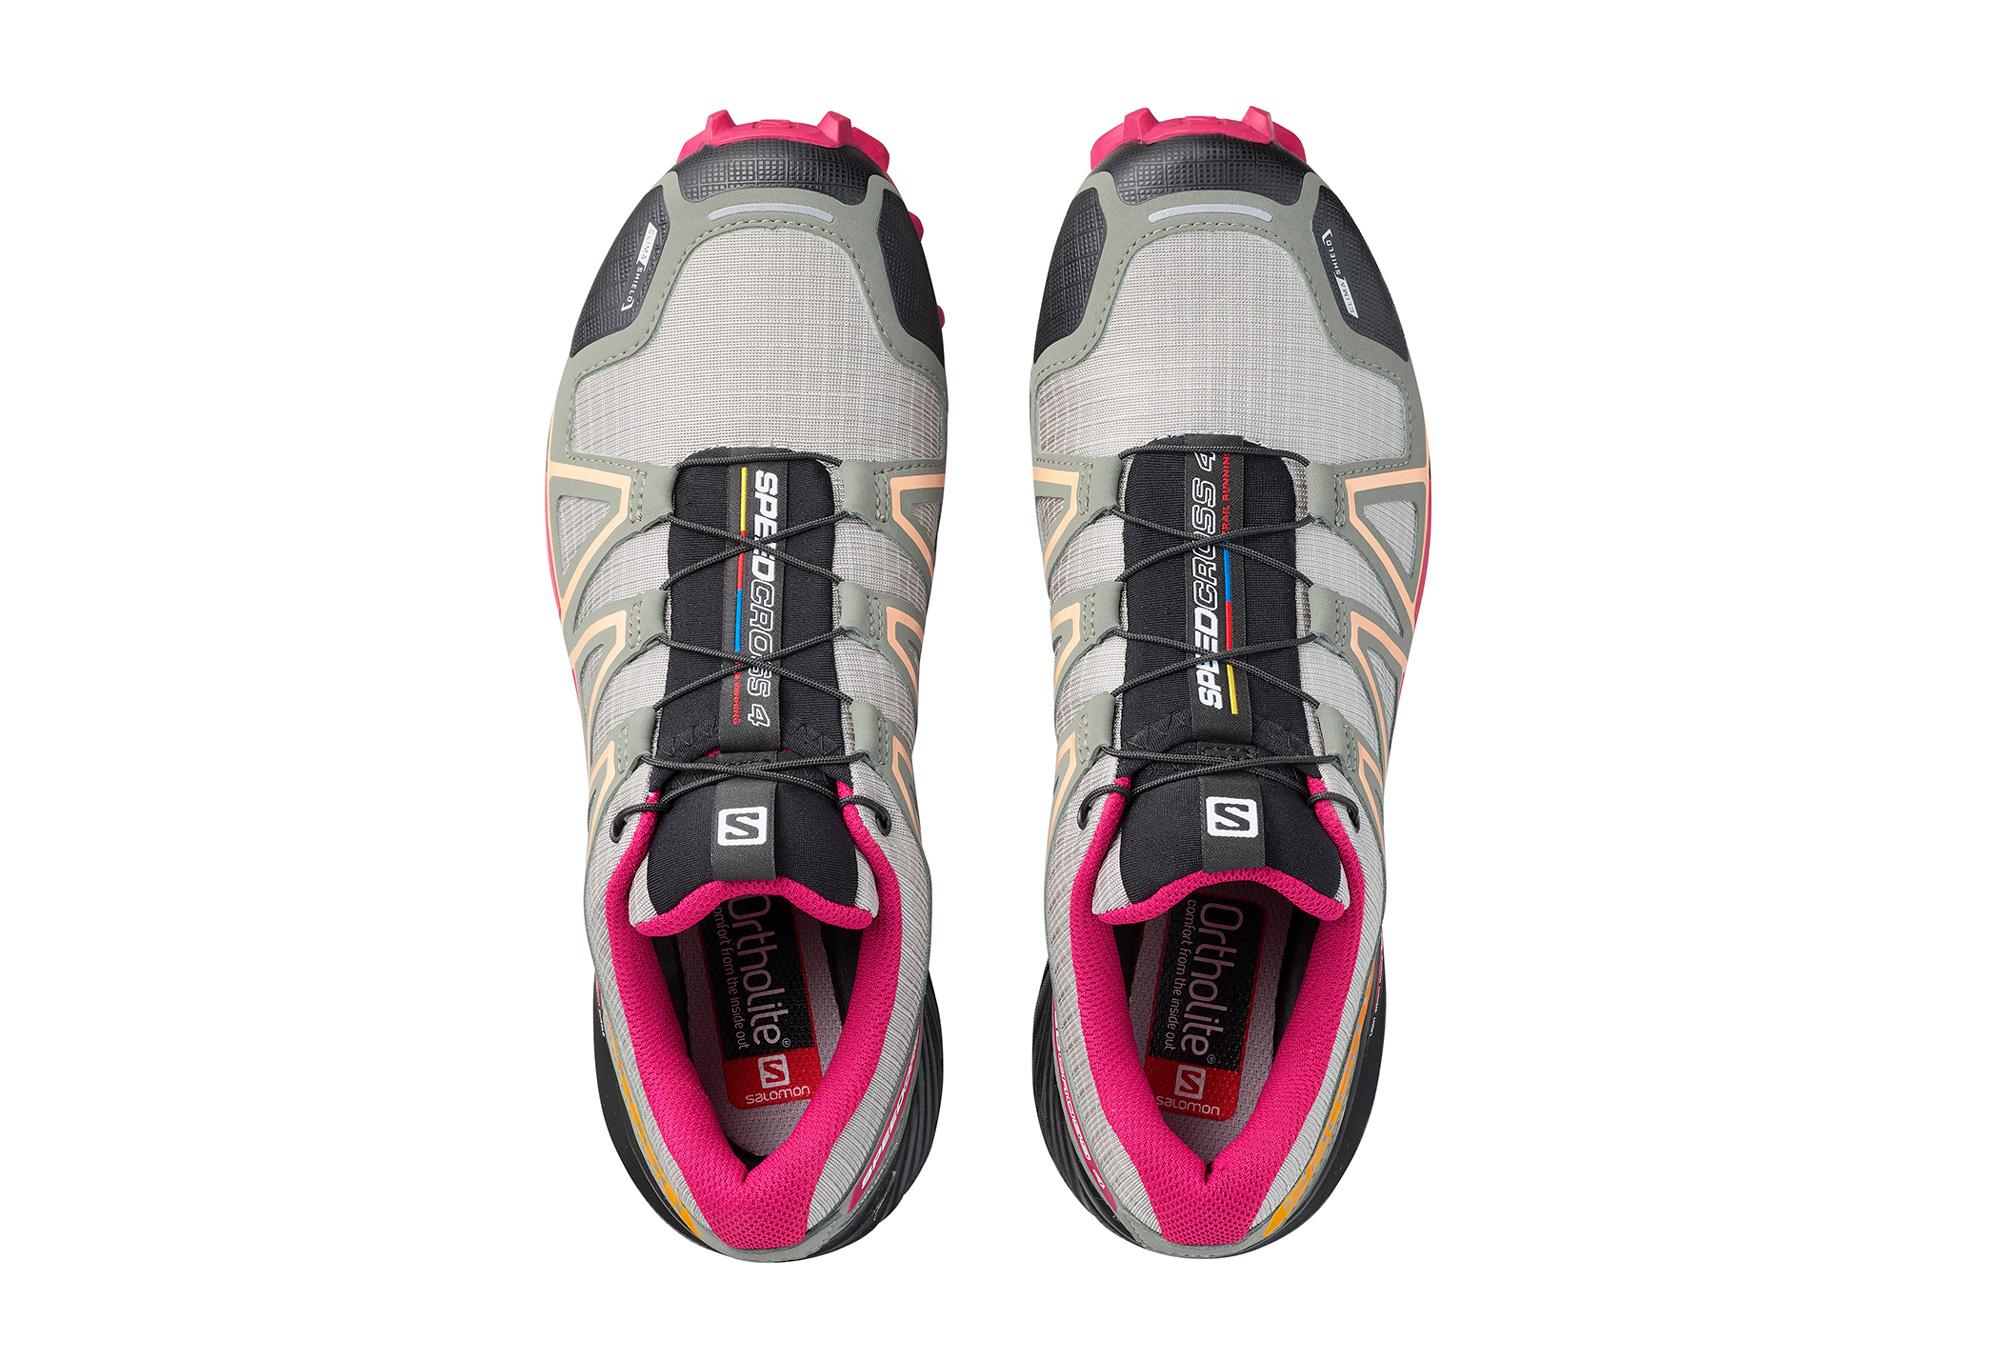 4 Trail Salomon Femme Cs Chaussures Speedcross Gris De Rose tXfgw